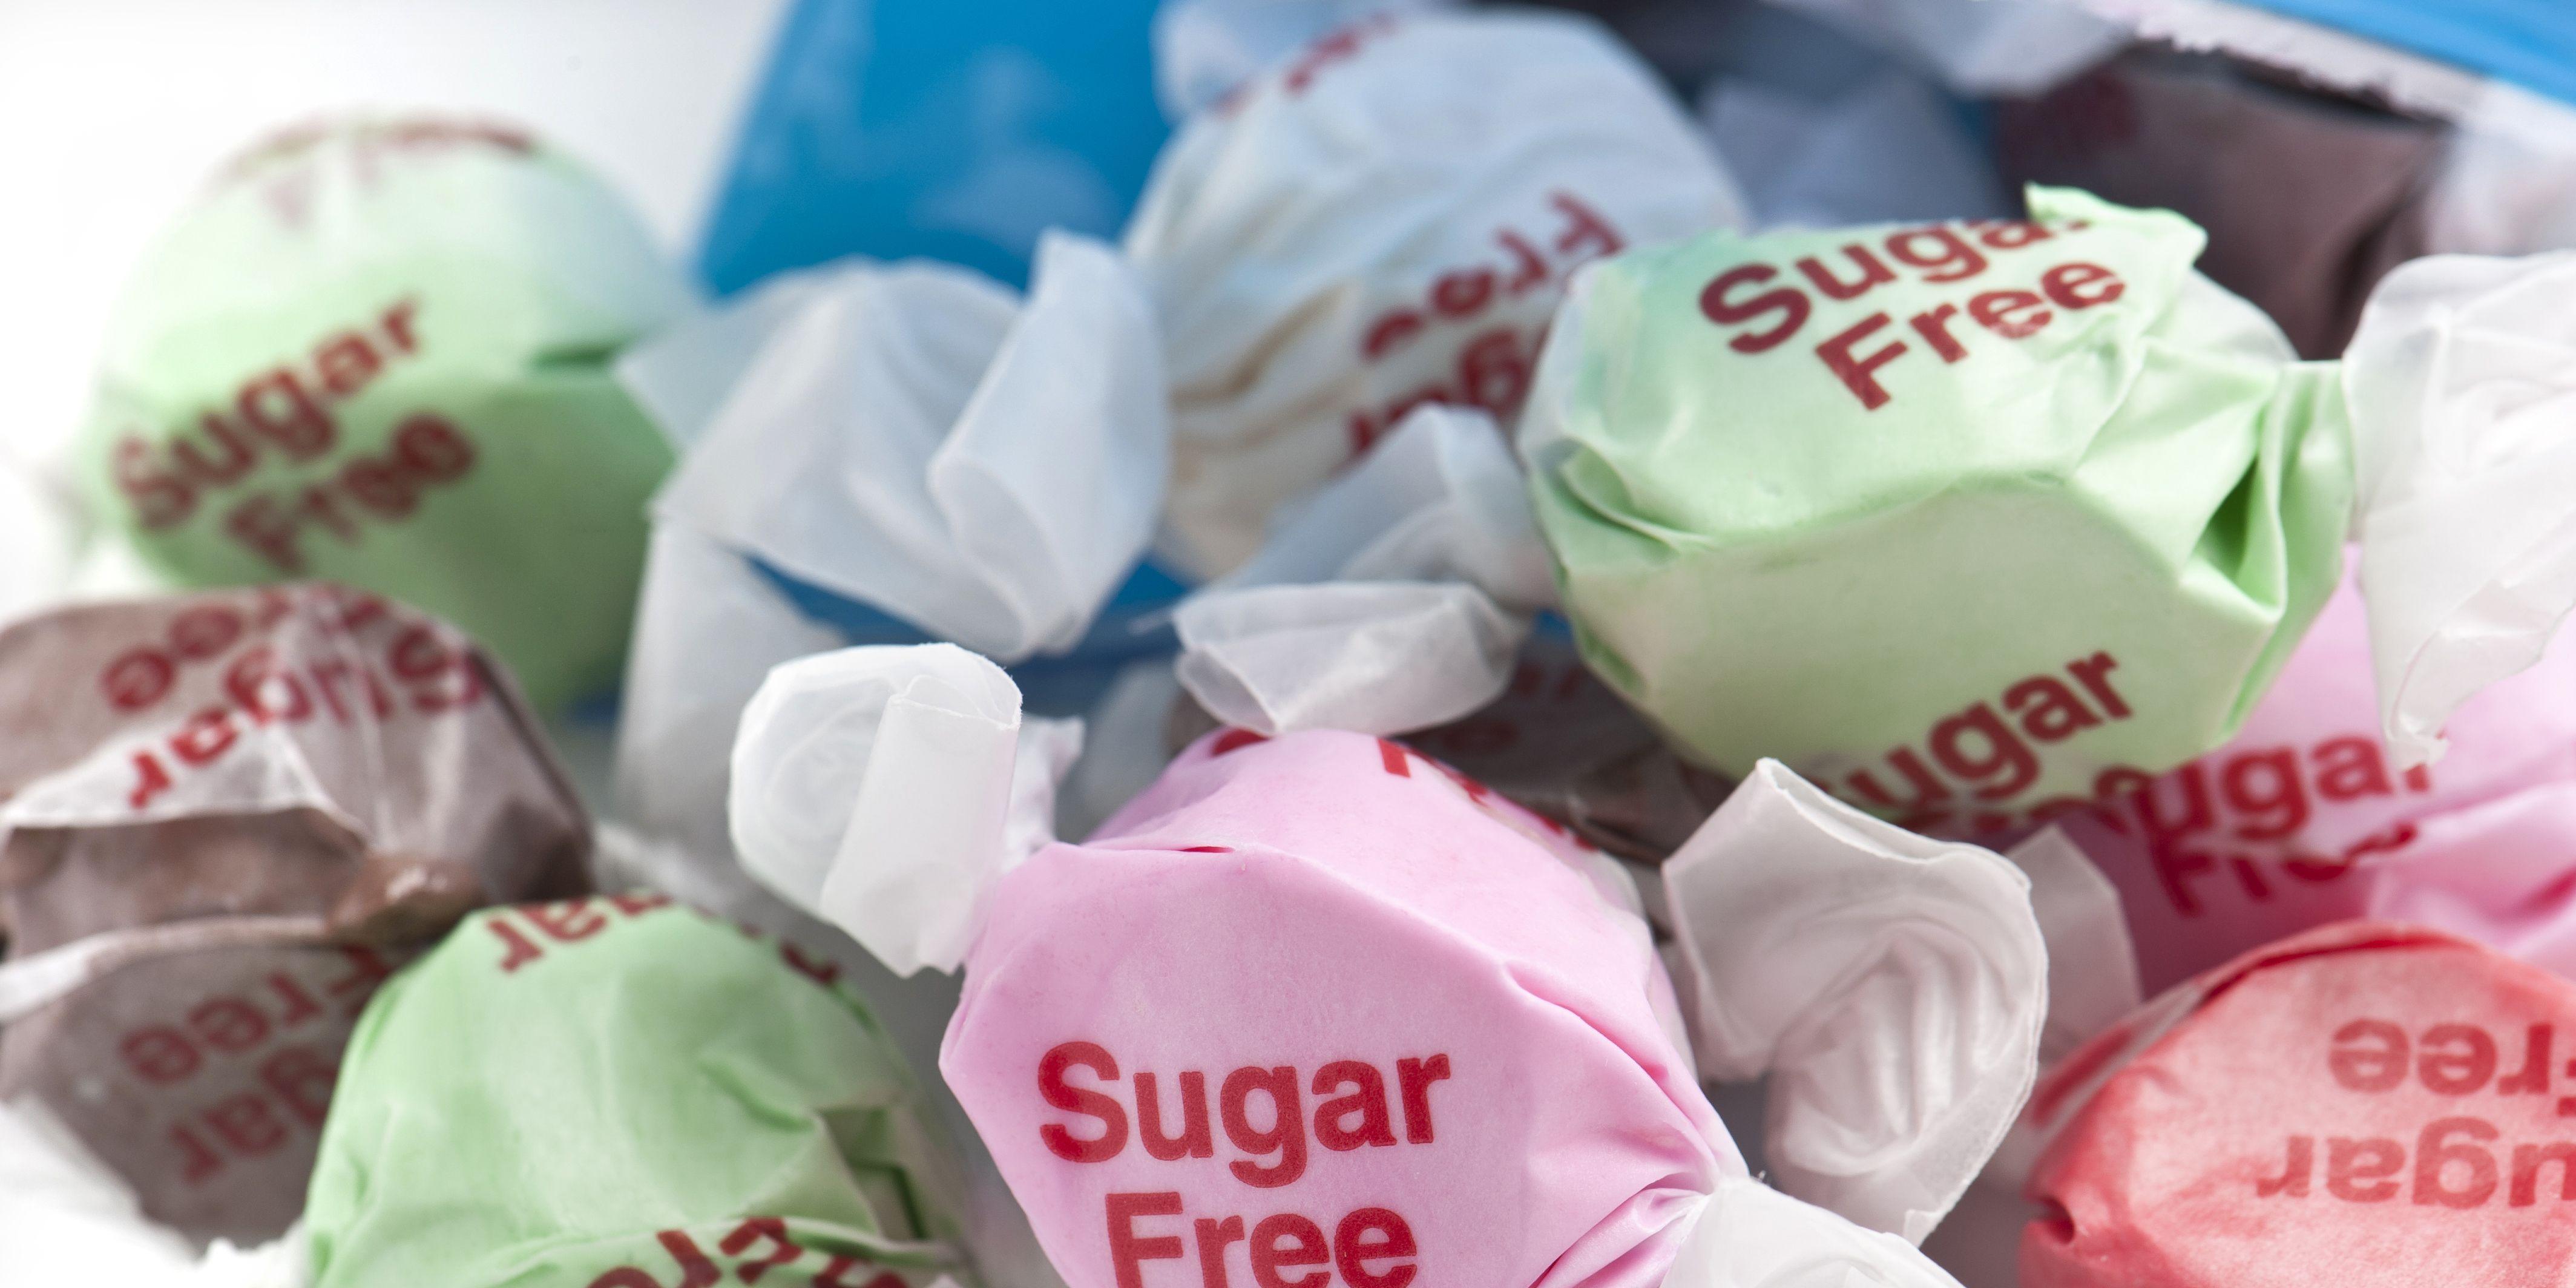 Sugar free Candies